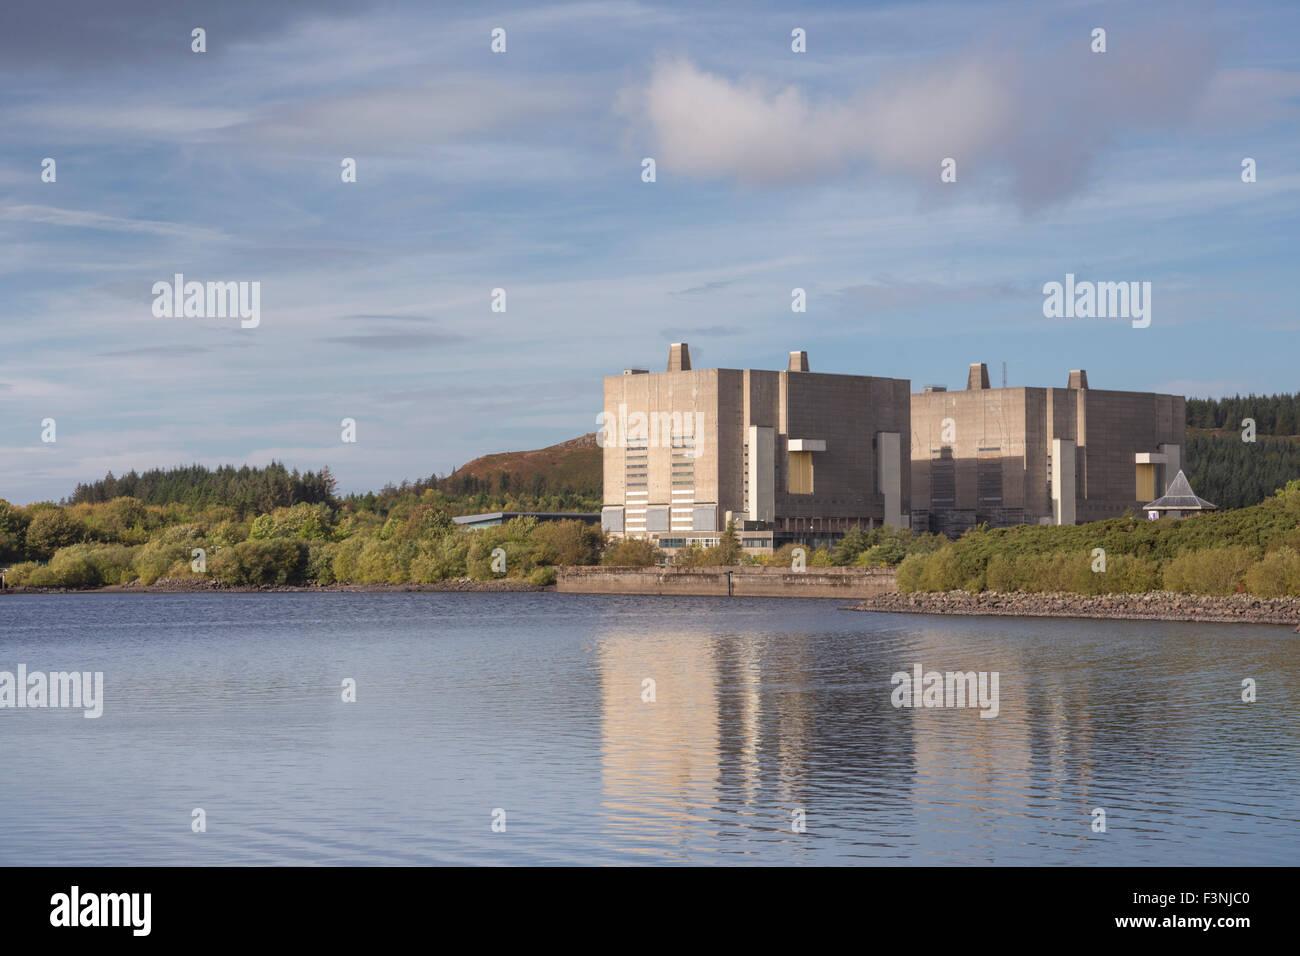 The decommissioned Trawsfynydd Nuclear Power Station, Snowdonia National Park,  Gwynedd, Wales. - Stock Image